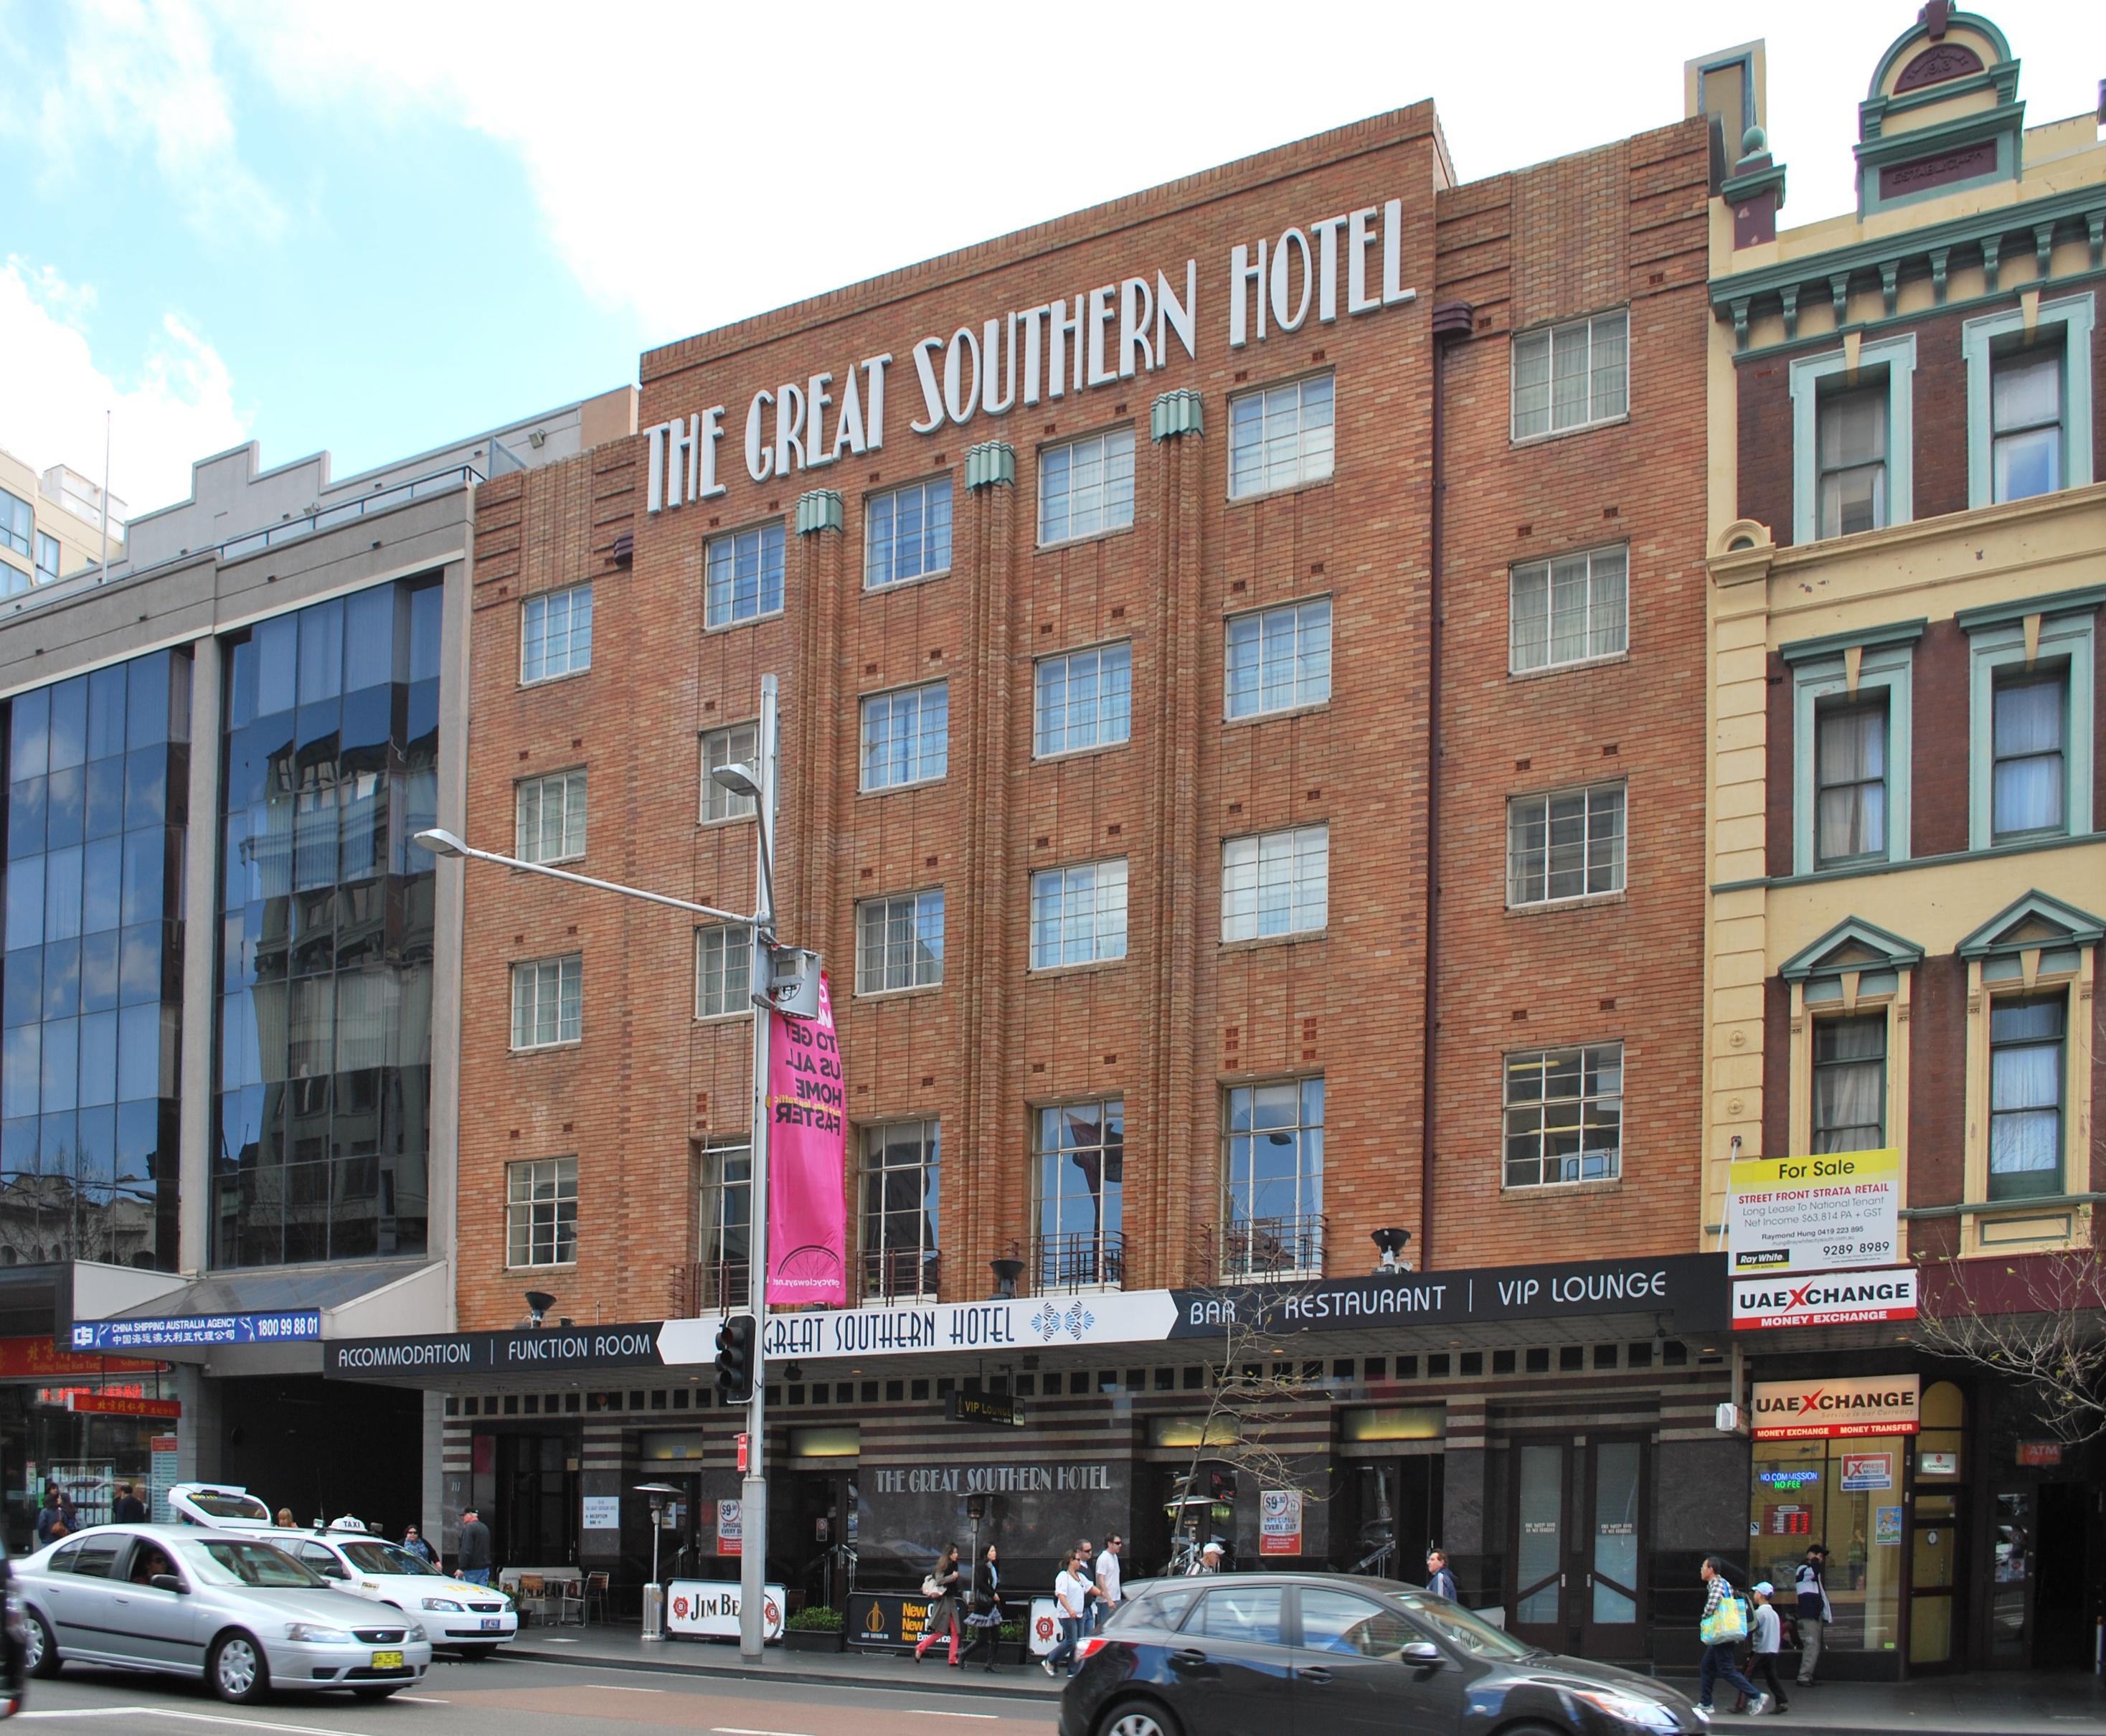 Sydney Street Hotel London